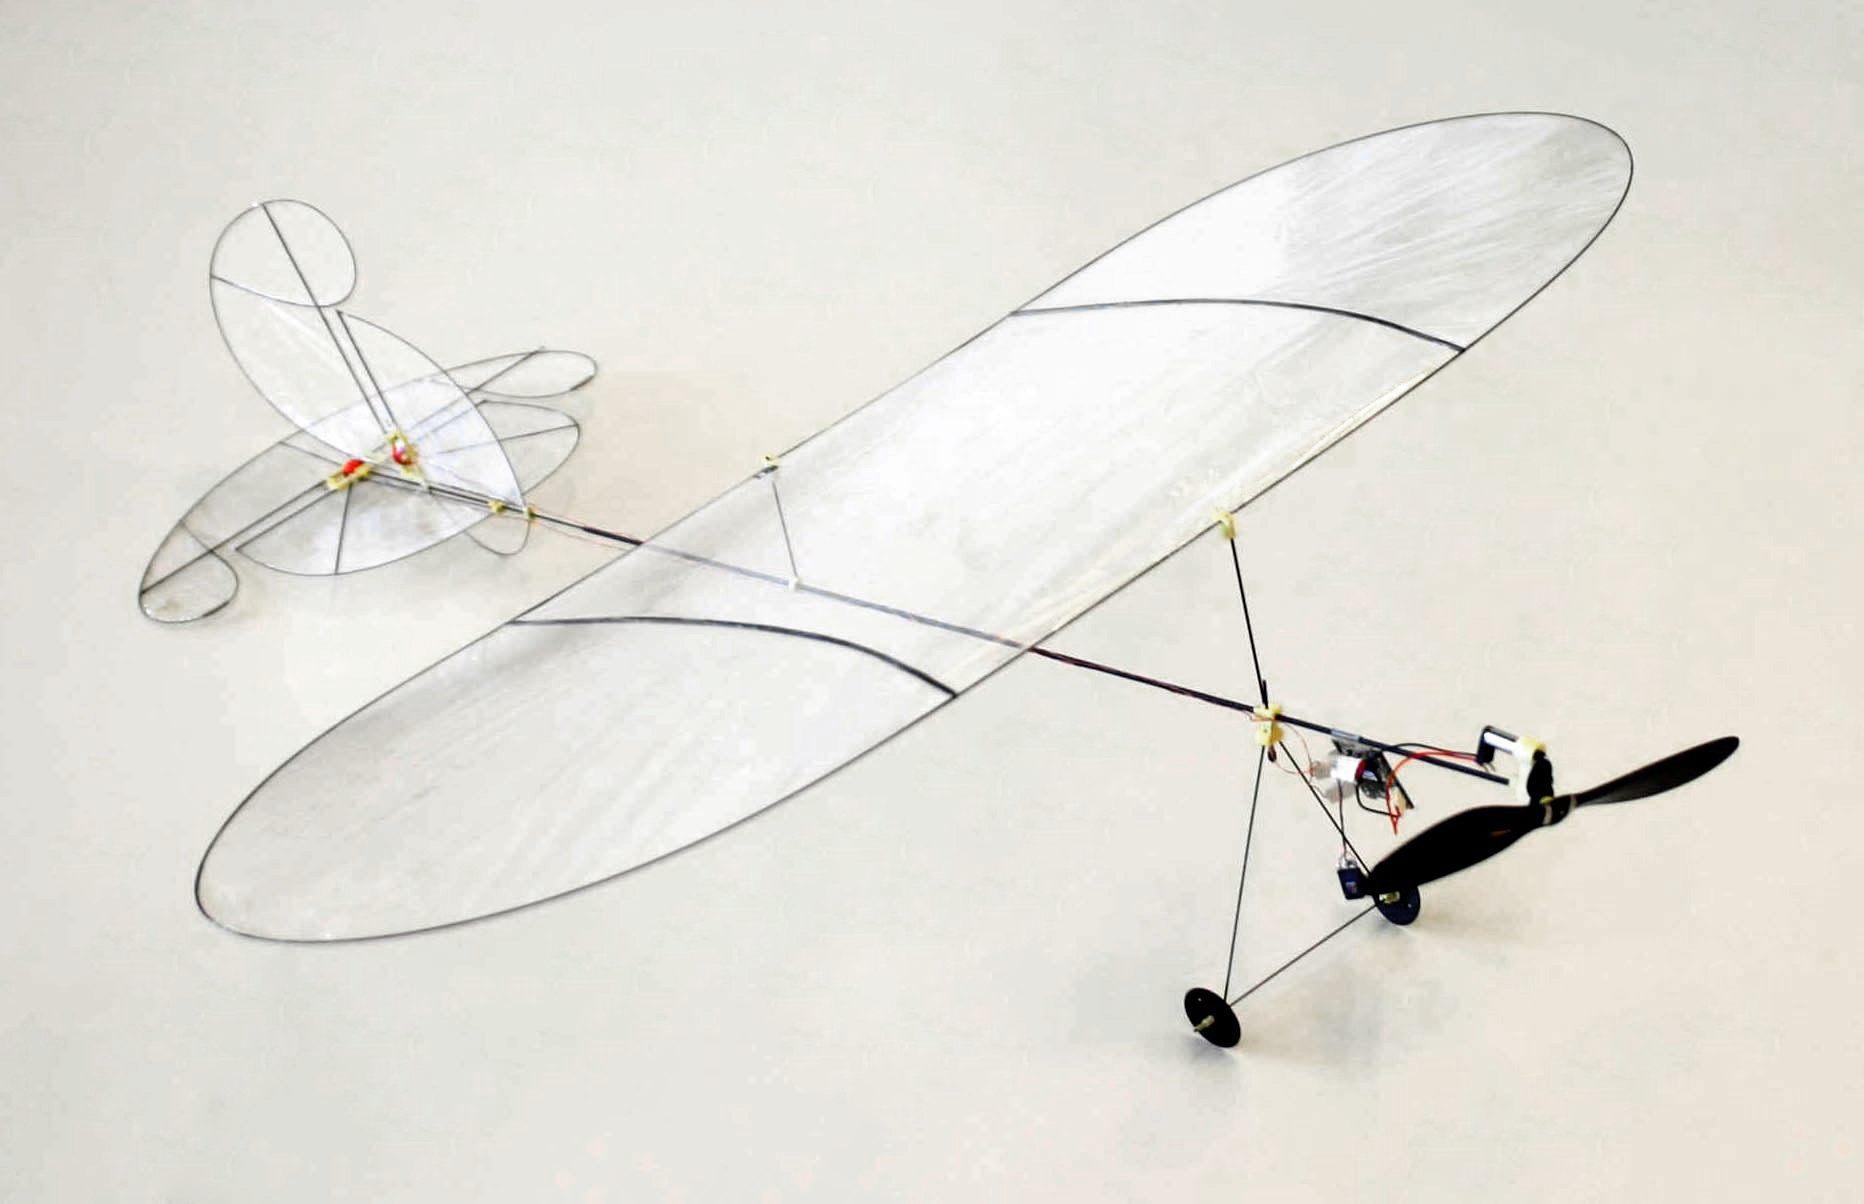 Airplane Kit Ultralight Aircraft